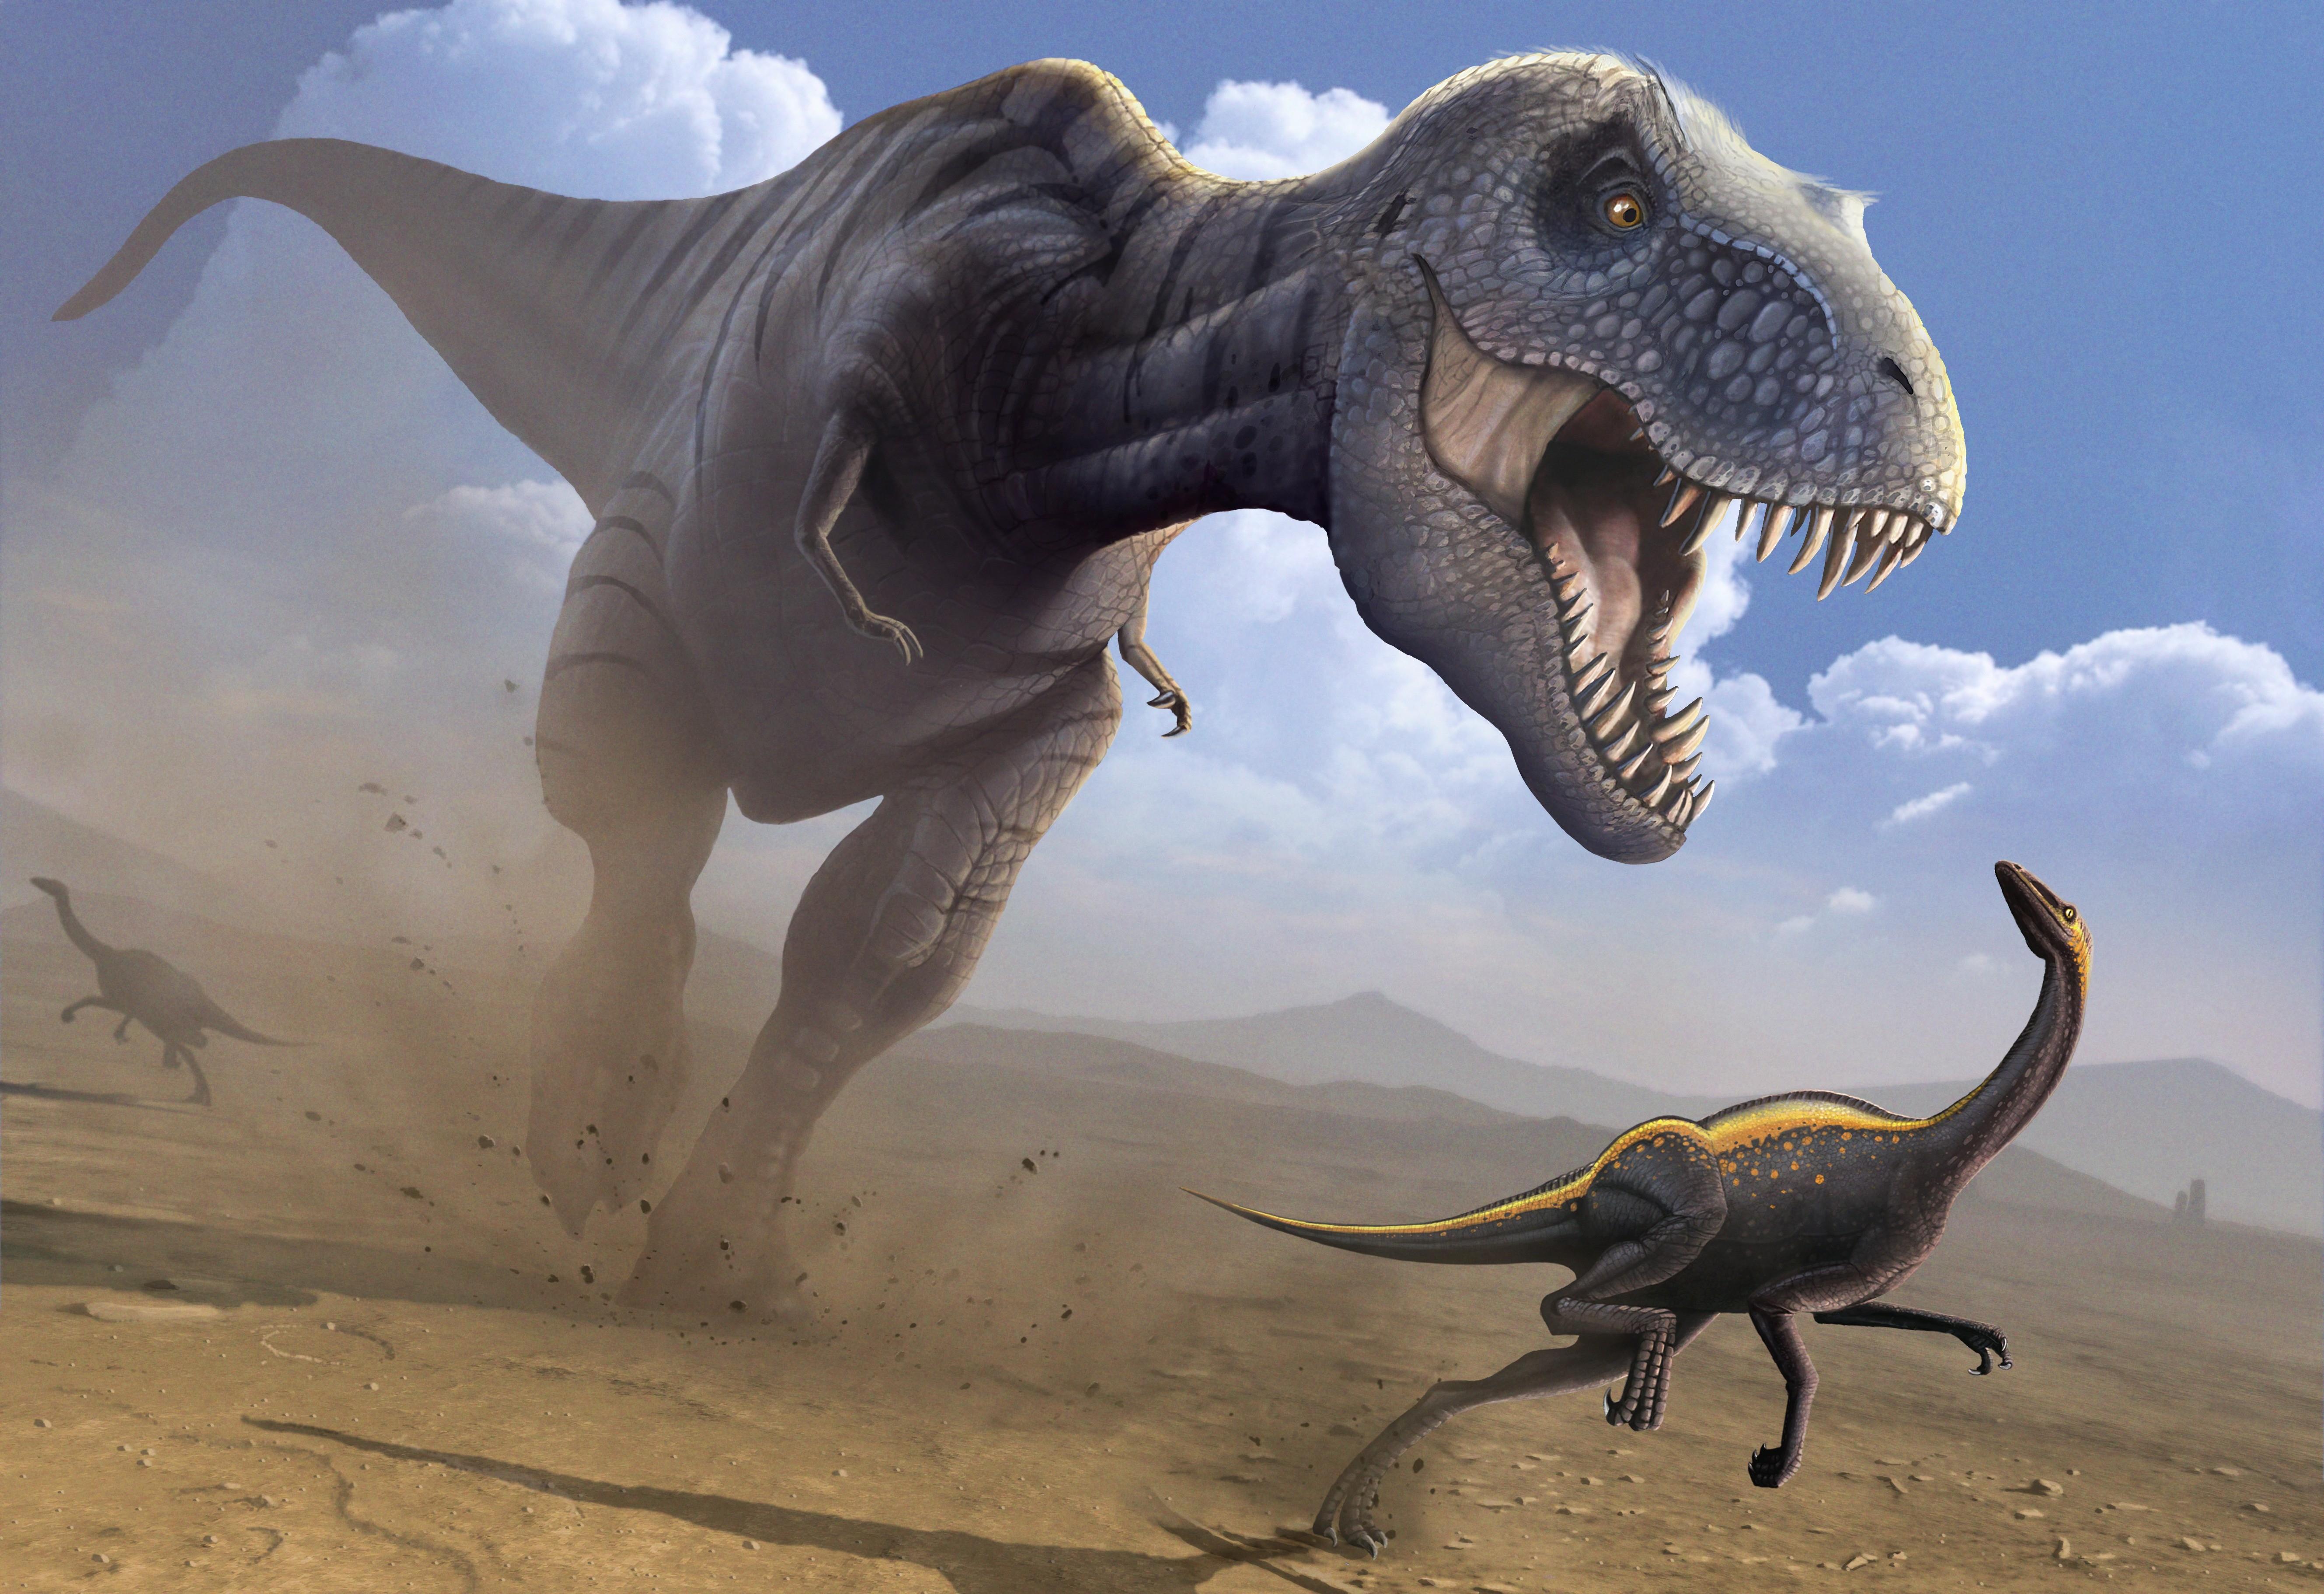 Wallpaper Tyrannosaurus, Ornithomimus, Dinosaur, Art, Art concernant Dinosaure Tyrex